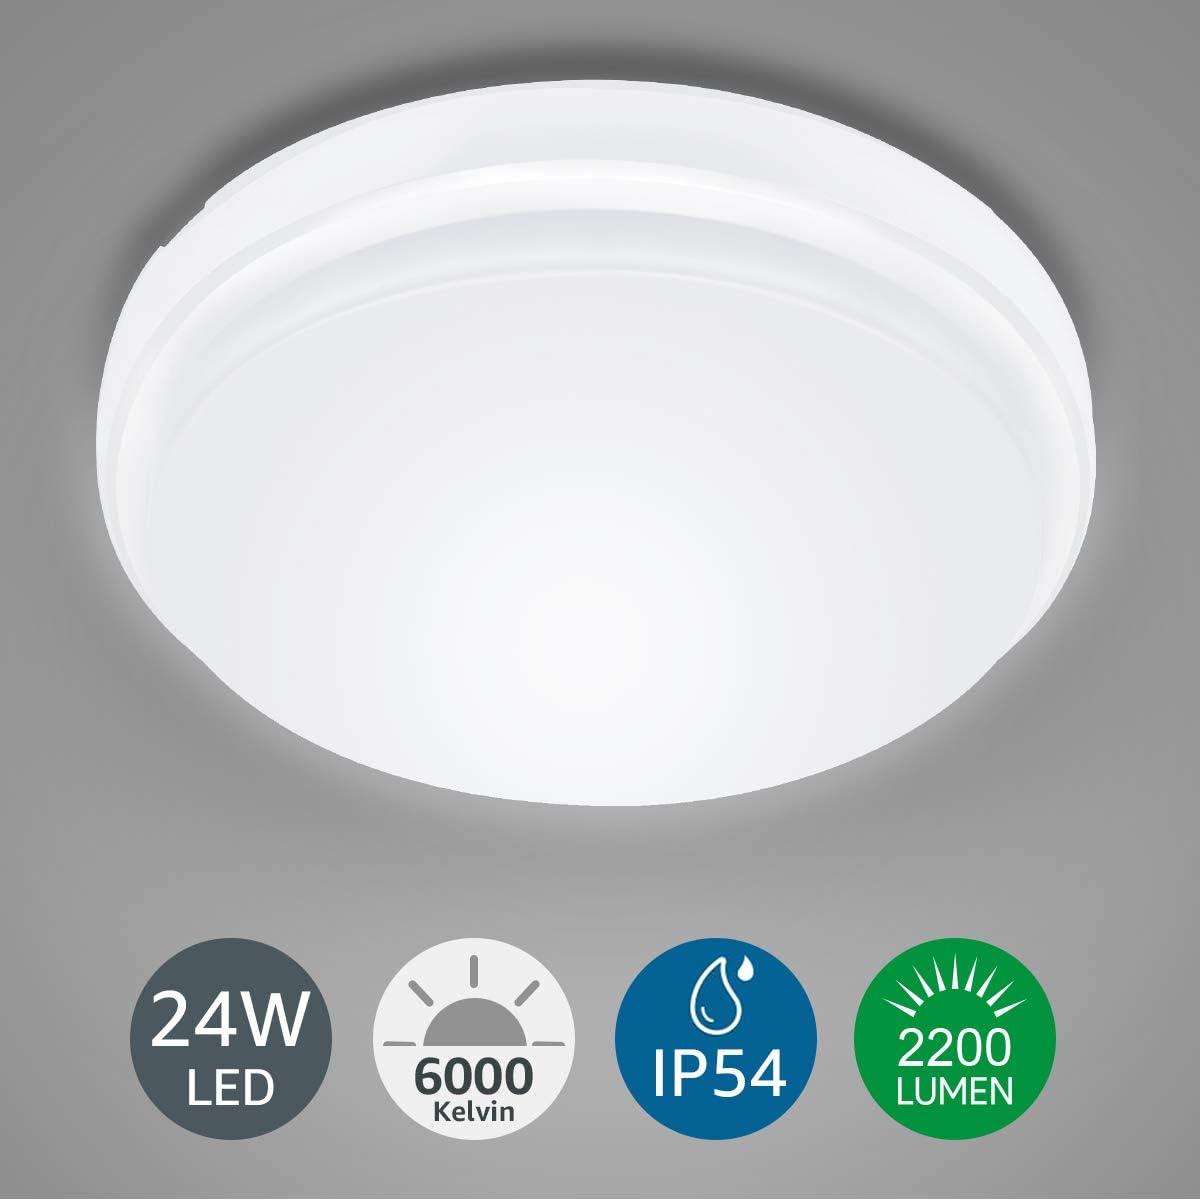 LE Plafón LED Lámpara de Techo 24W Equivalente a 200W Resistente al Agua IP54 Blanco Frío 2200 Lúmenes 6000K Luz de Techo LED para baño Dormitorio Cocina Sala de Estar Comedor Balcón Pasillo